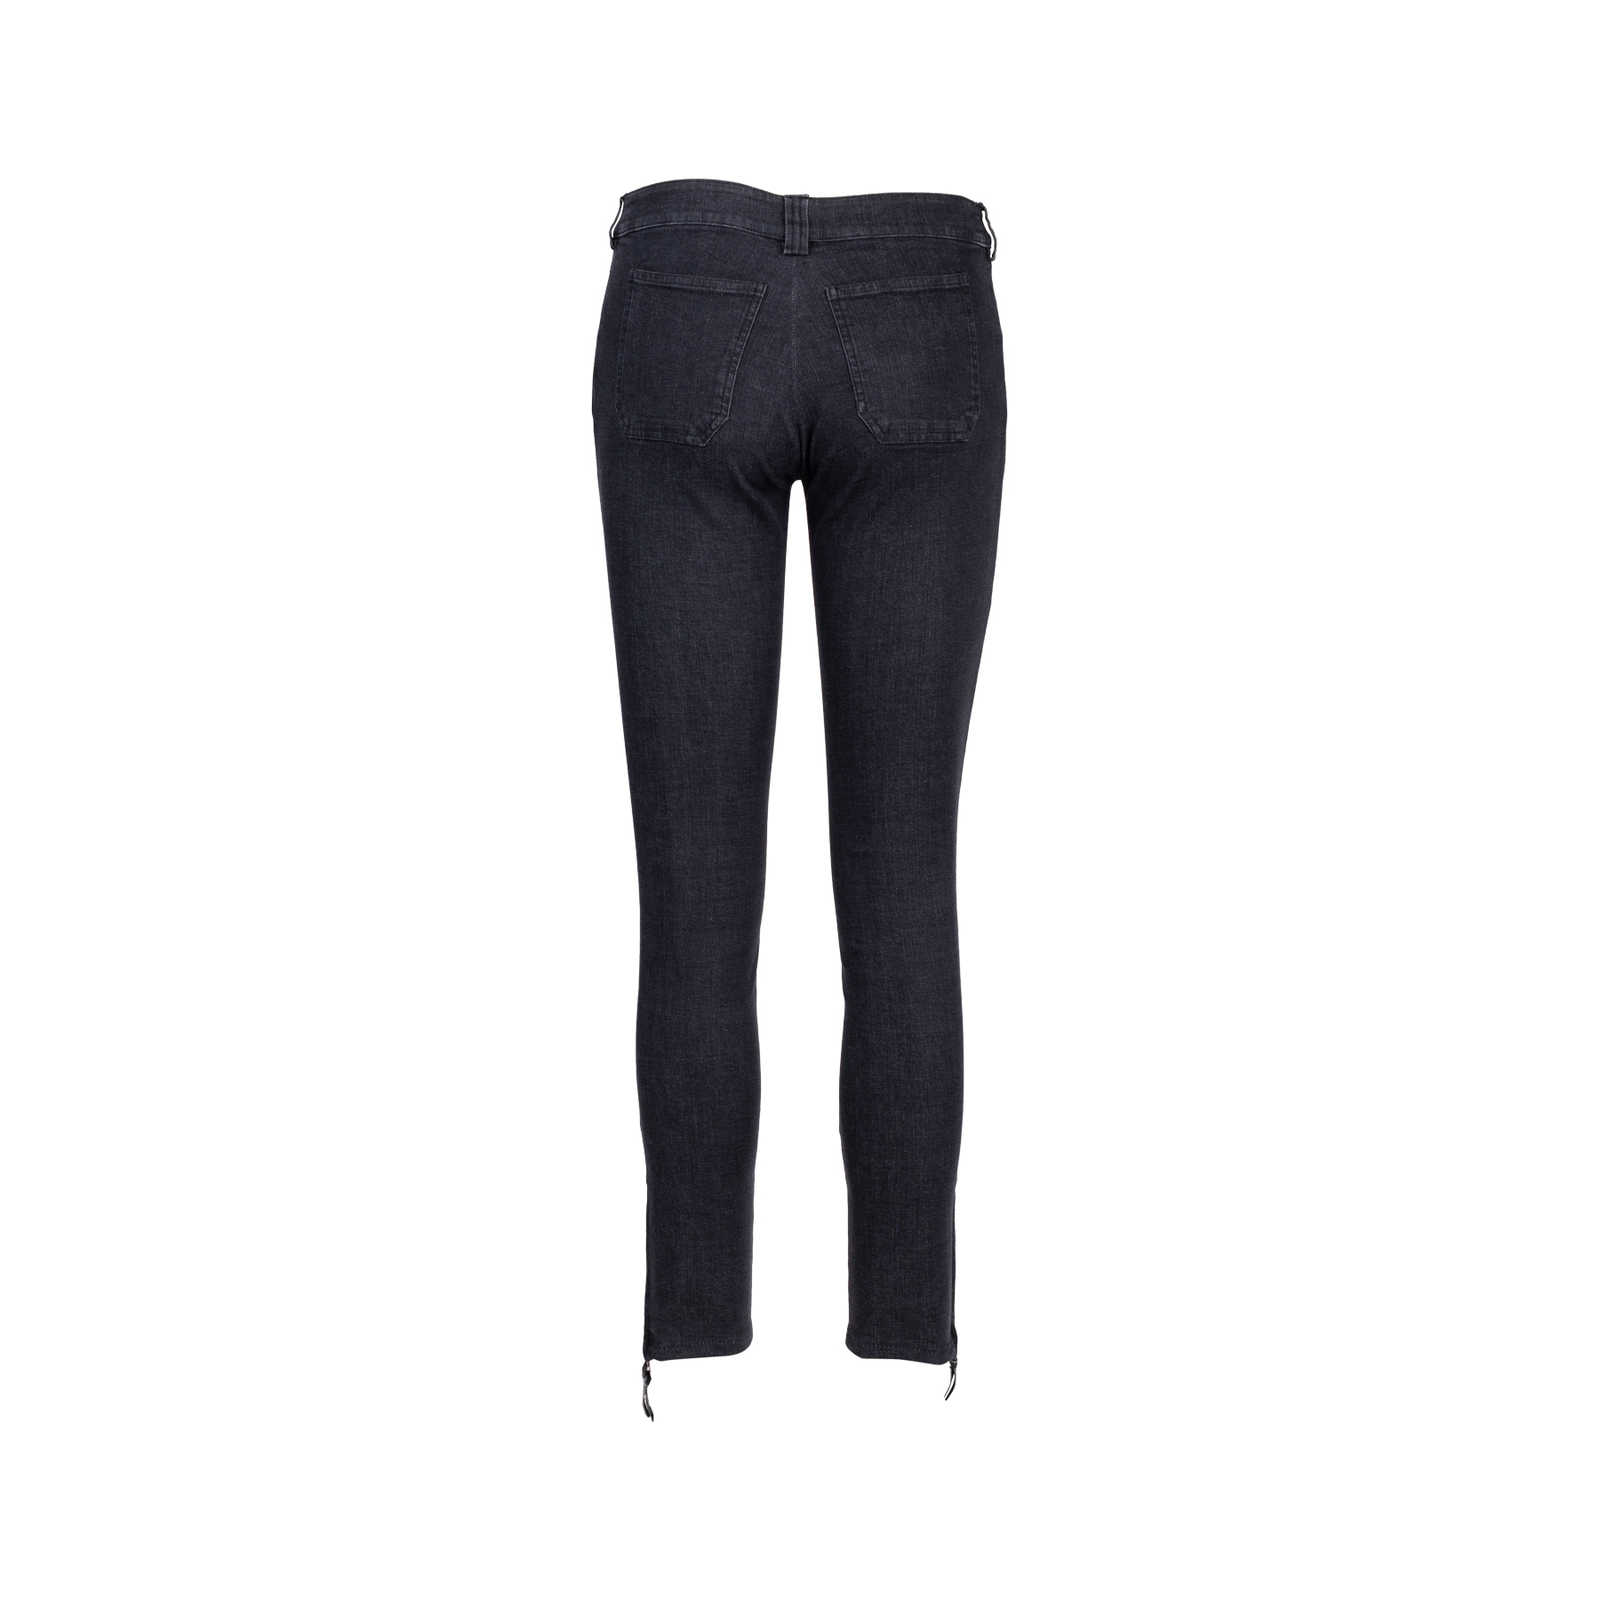 09a16a599130 ... Authentic Second Hand Balenciaga Zip Denim Jeans (PSS-515-00160) -  Thumbnail ...